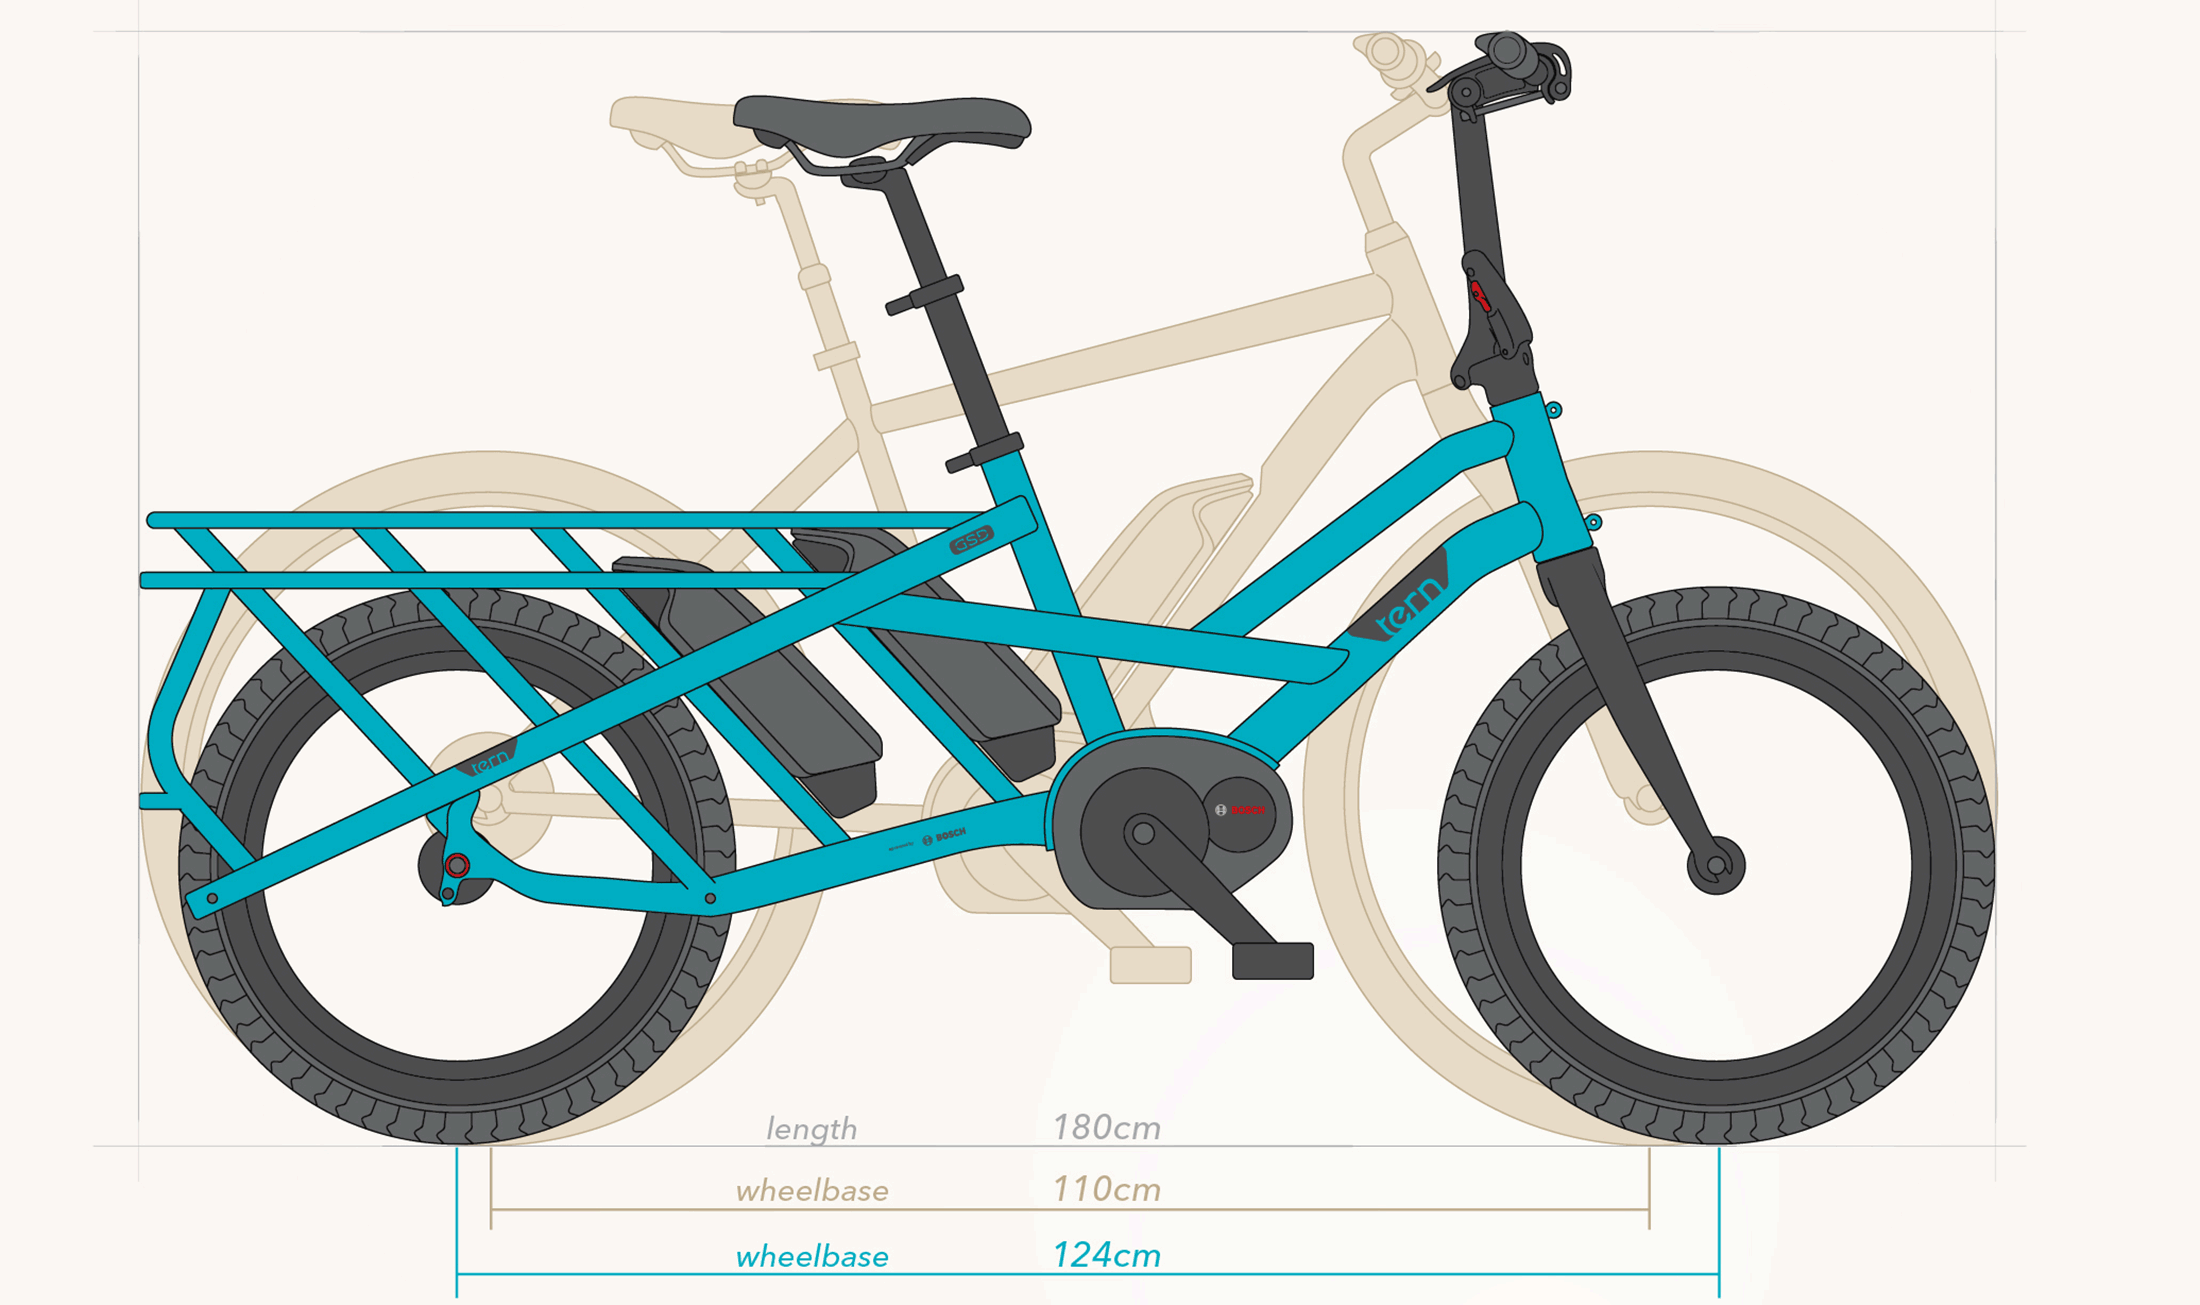 Tern improves its already awesome folding Vektron and SUV-like GSD cargo  bikes - Electrek